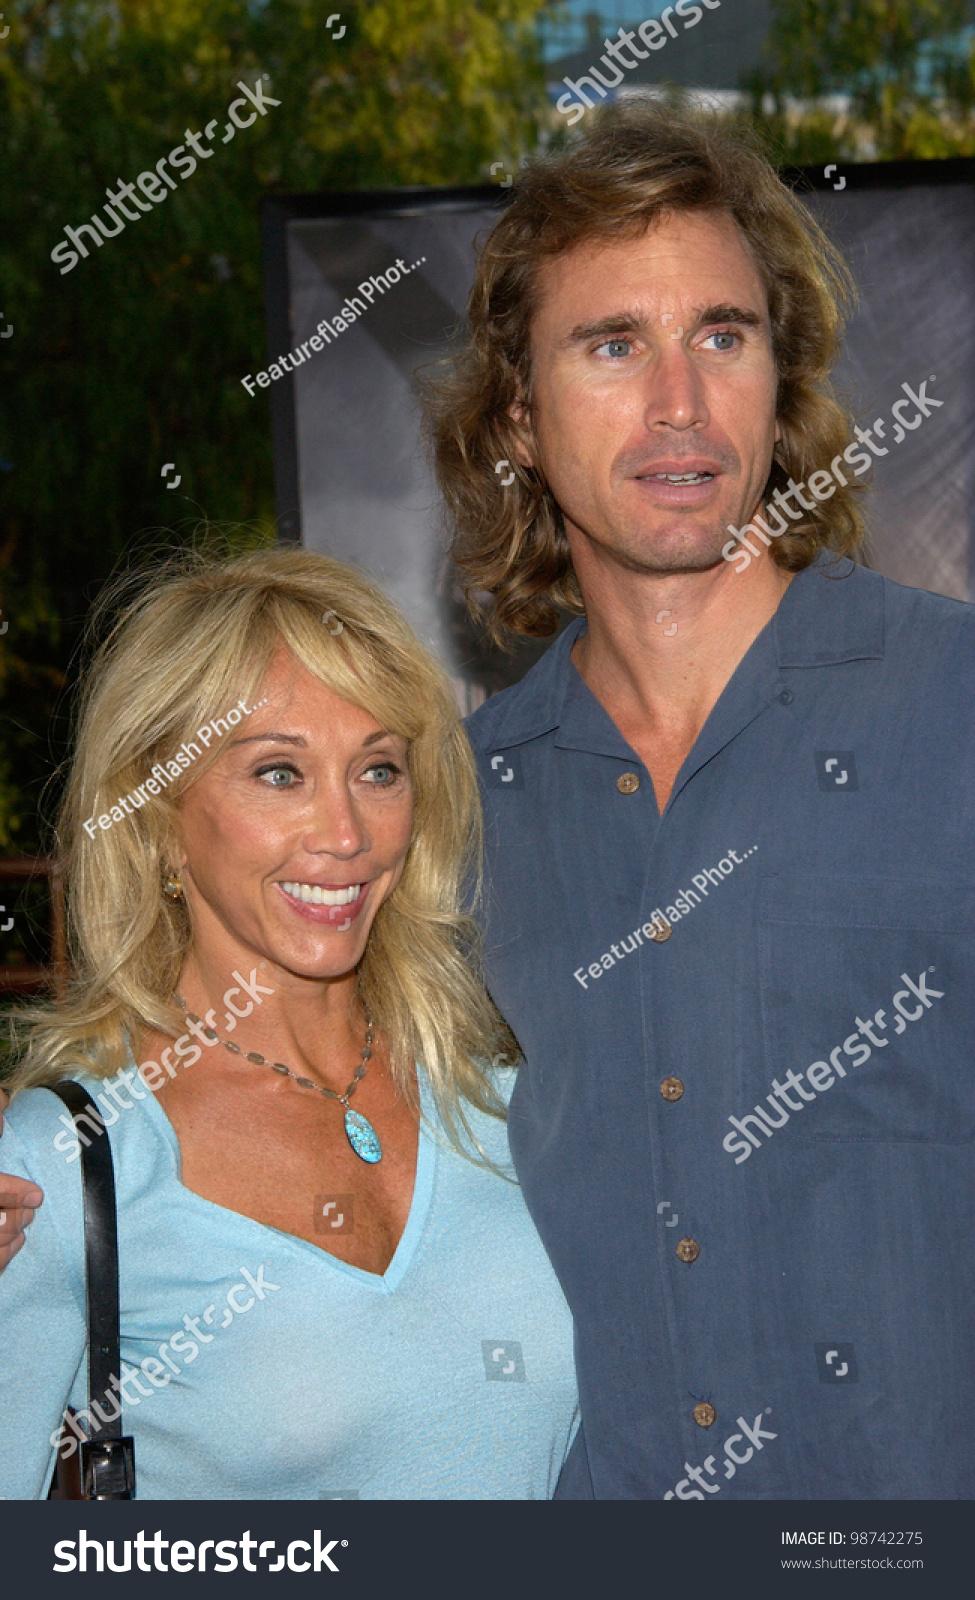 Casado In Los Dating Angeles Widowed